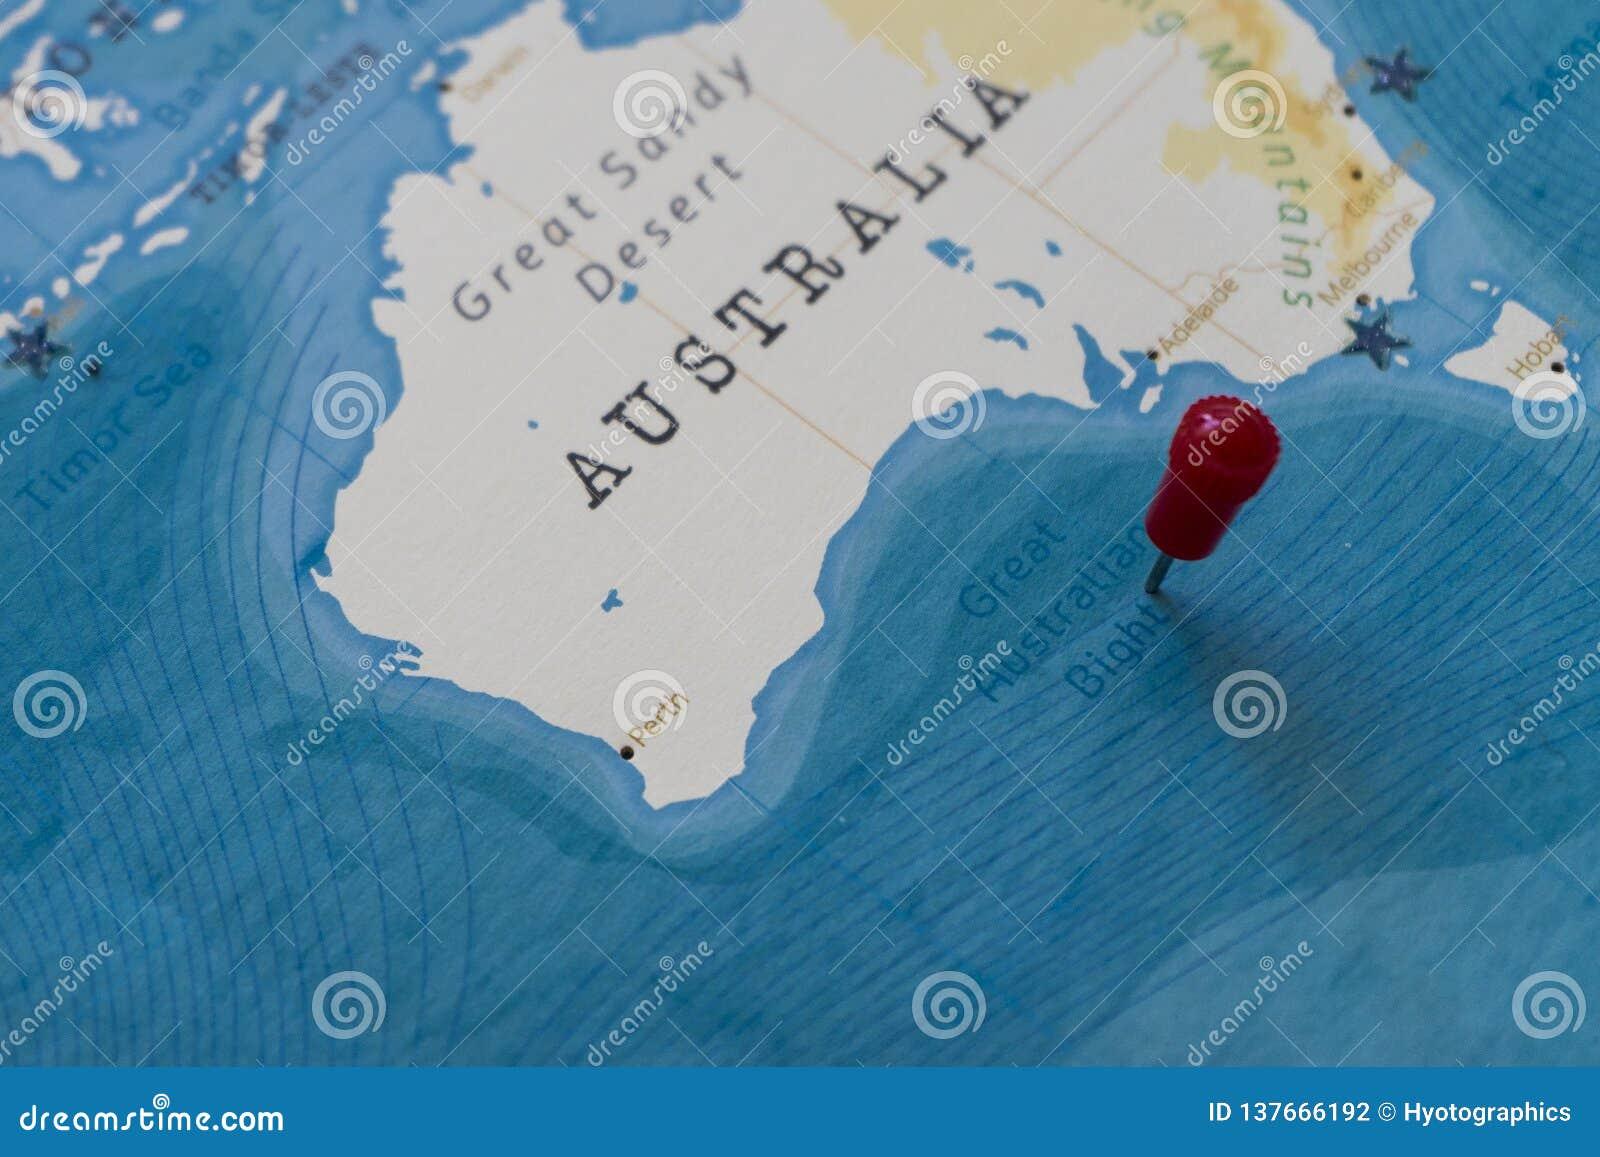 Australia Map Great Australian Bight.A Pin On Great Australian Bight In The World Map Stock Photo